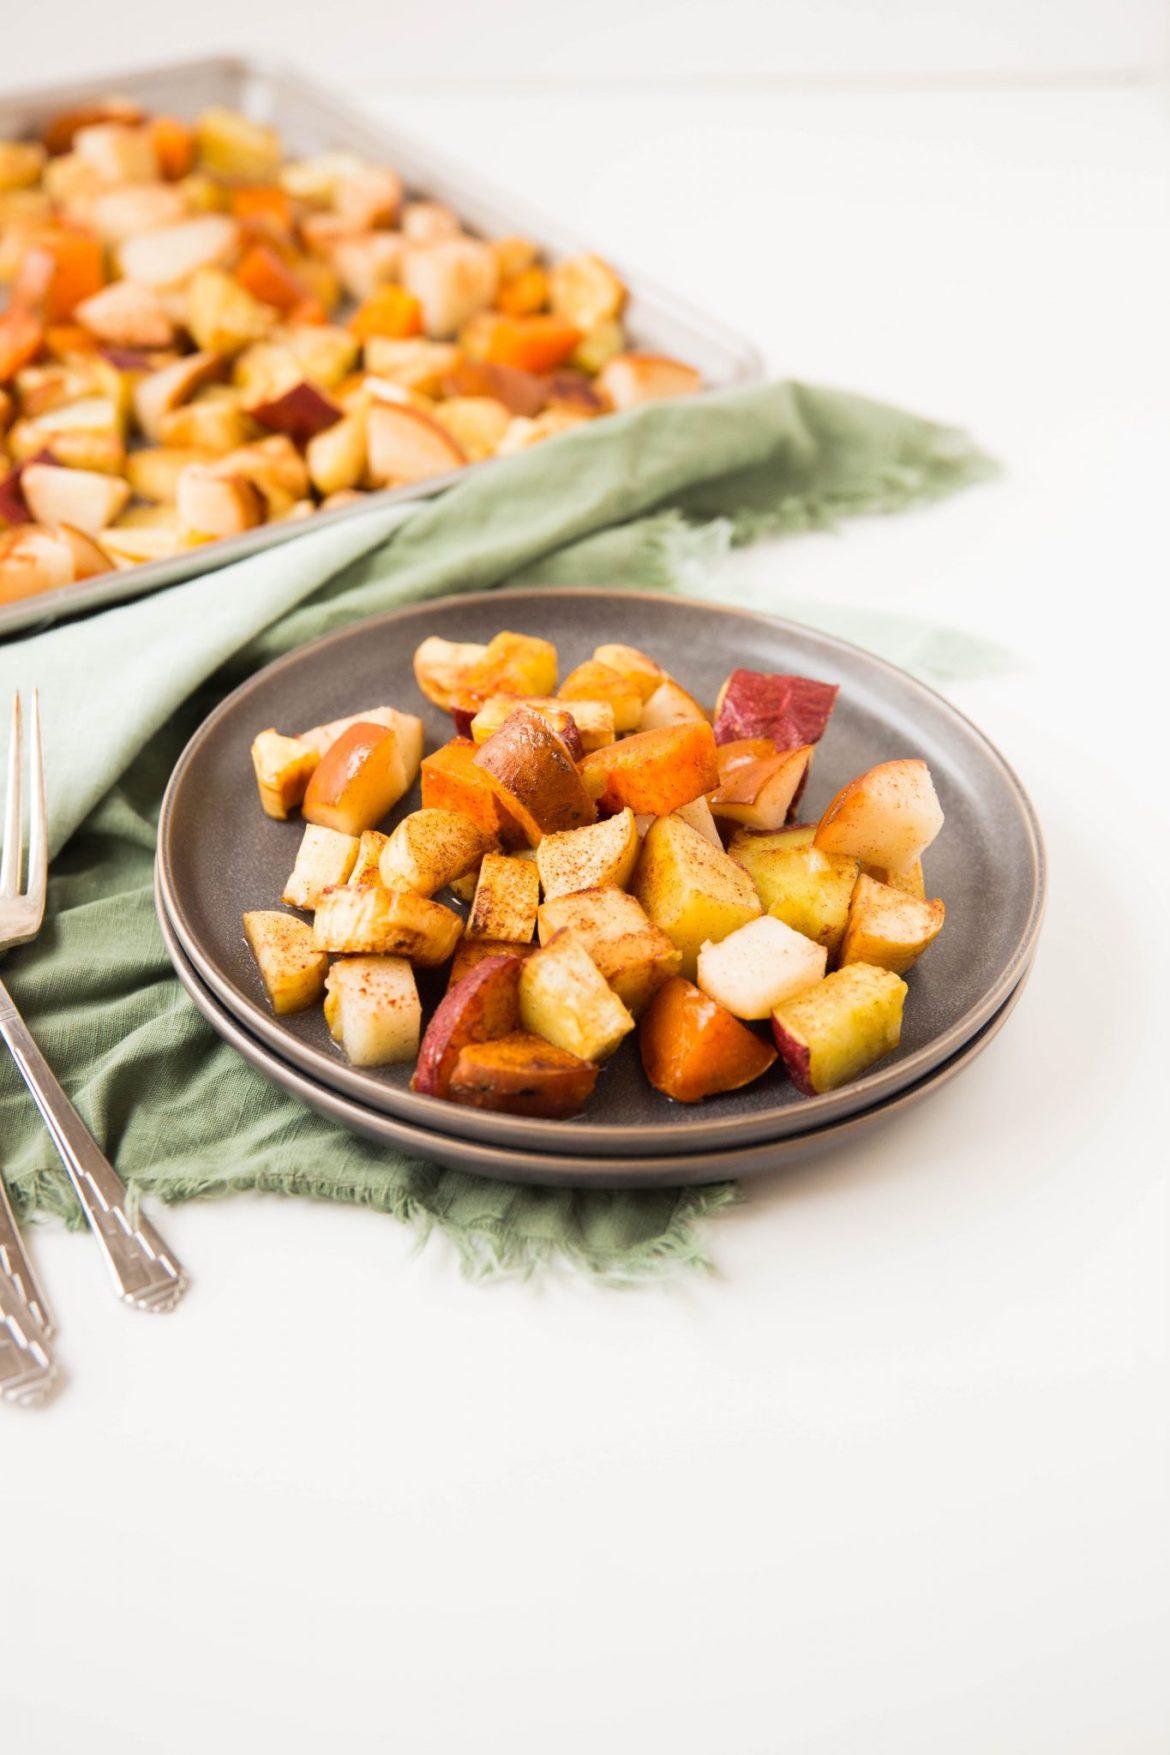 Cinnamon roasted sweet potatoes - Dr. Pingel